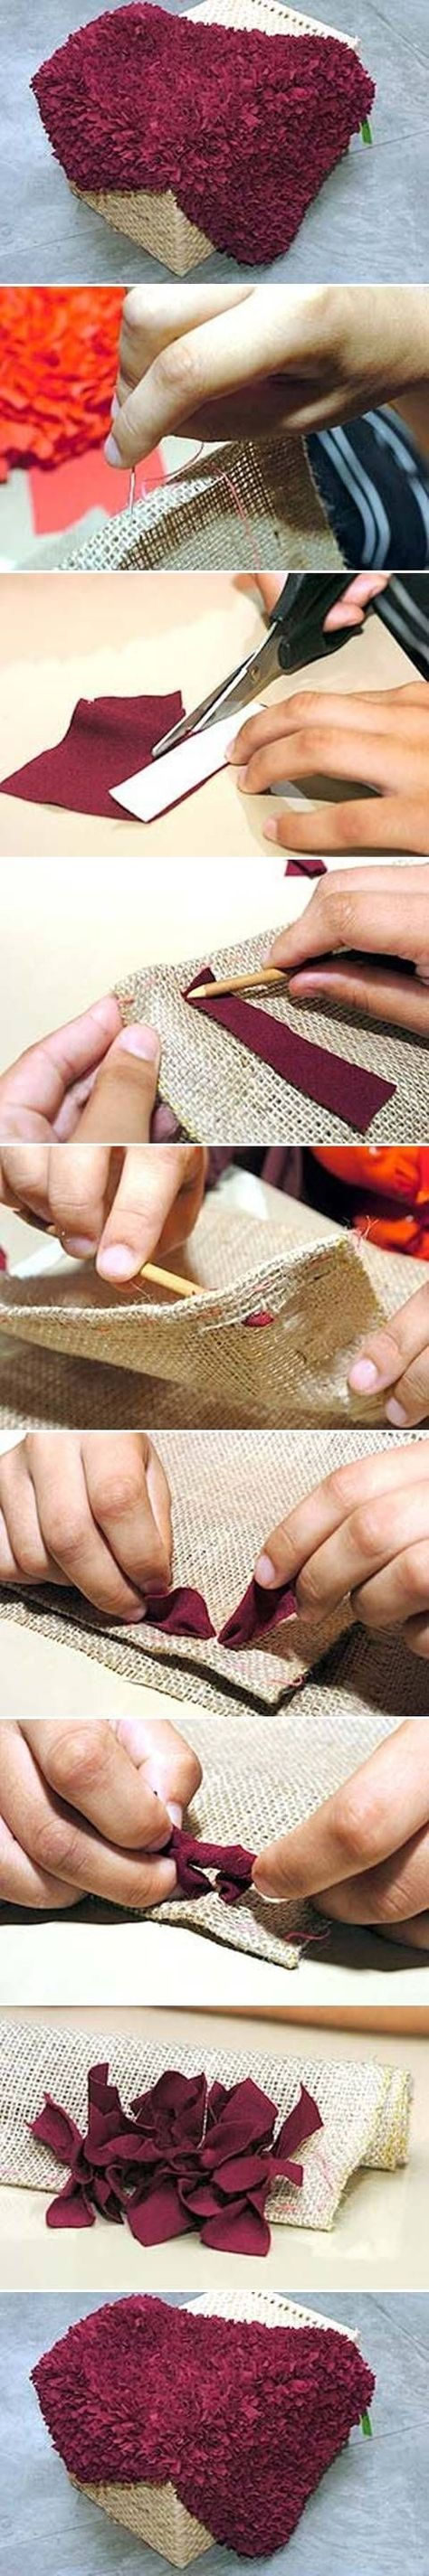 DIY Craft Fabric Rug diy crafts craft ideas easy crafts diy ideas diy idea diy home easy diy for the home crafty decor home ideas diy decorations diy rug